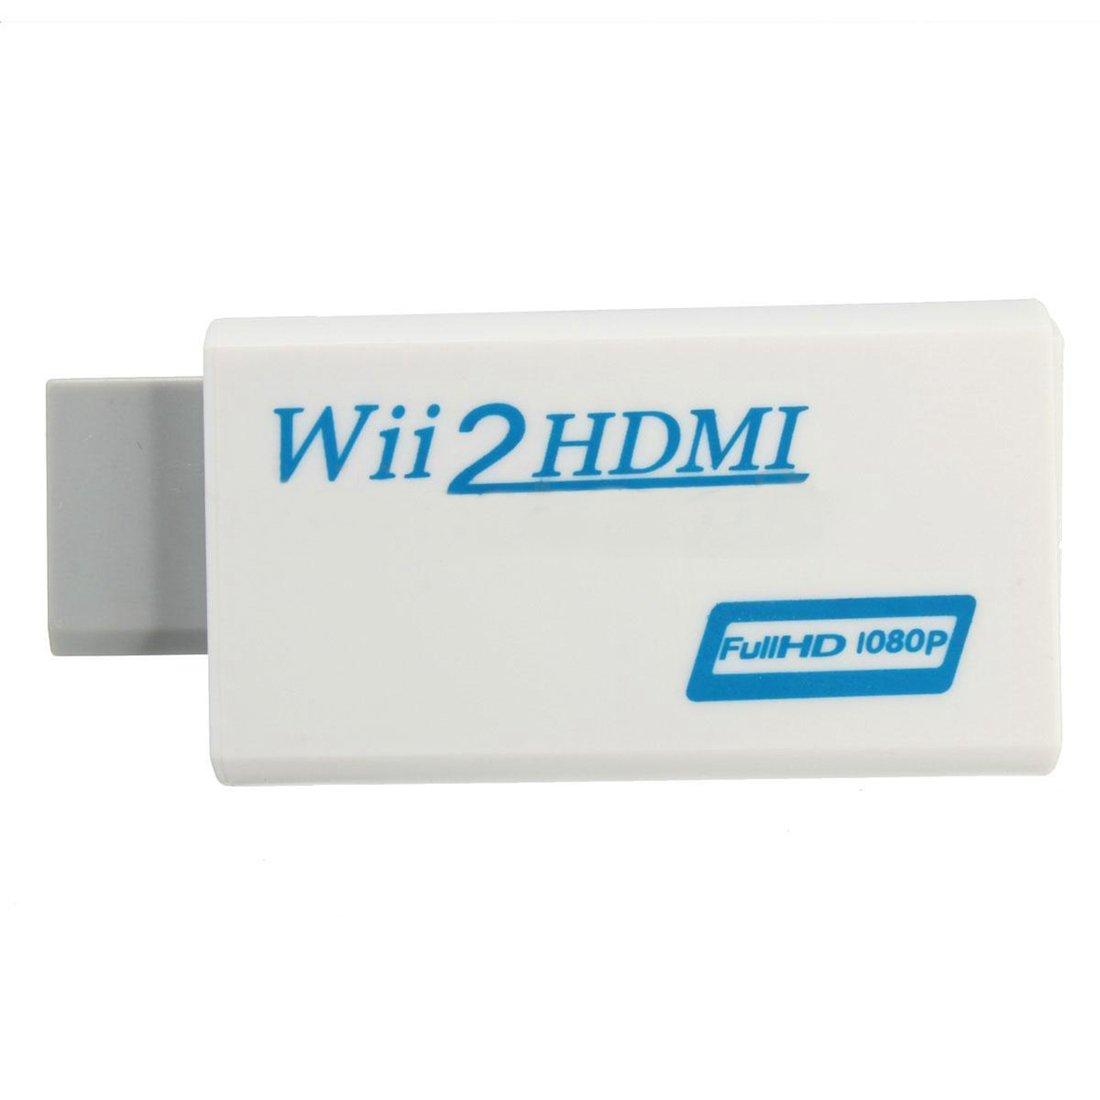 REFURBISHHOUSE Wii zu HDMI Wii2HDMI Full HD FHD 1080P Konverter Adapter 3,5 mm Audio Ausgang Buchse